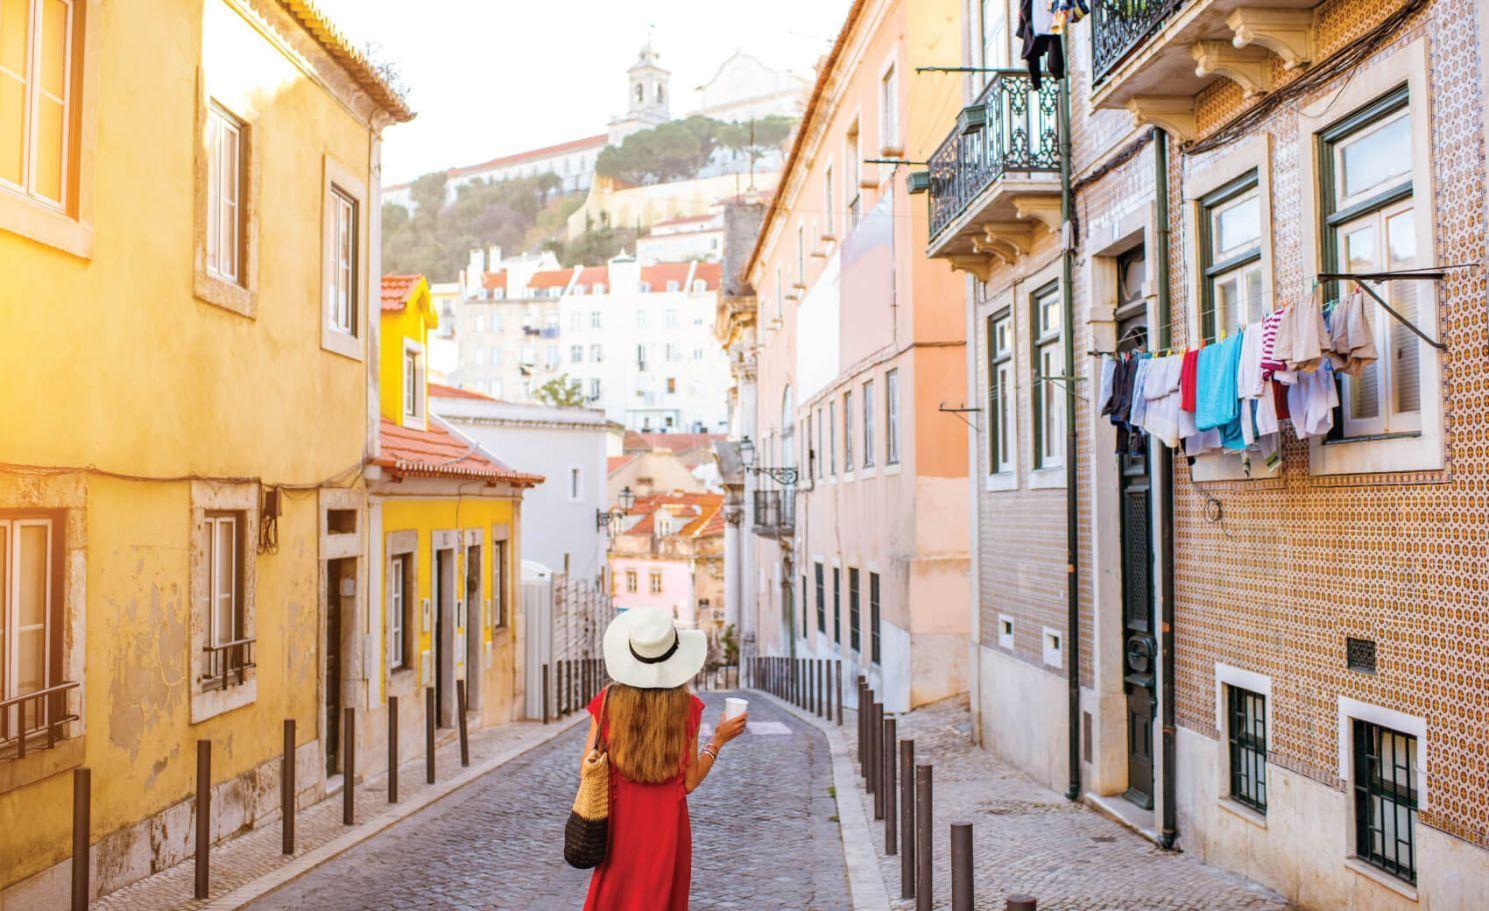 City walk in Alfama region during the morning light in Lisbon